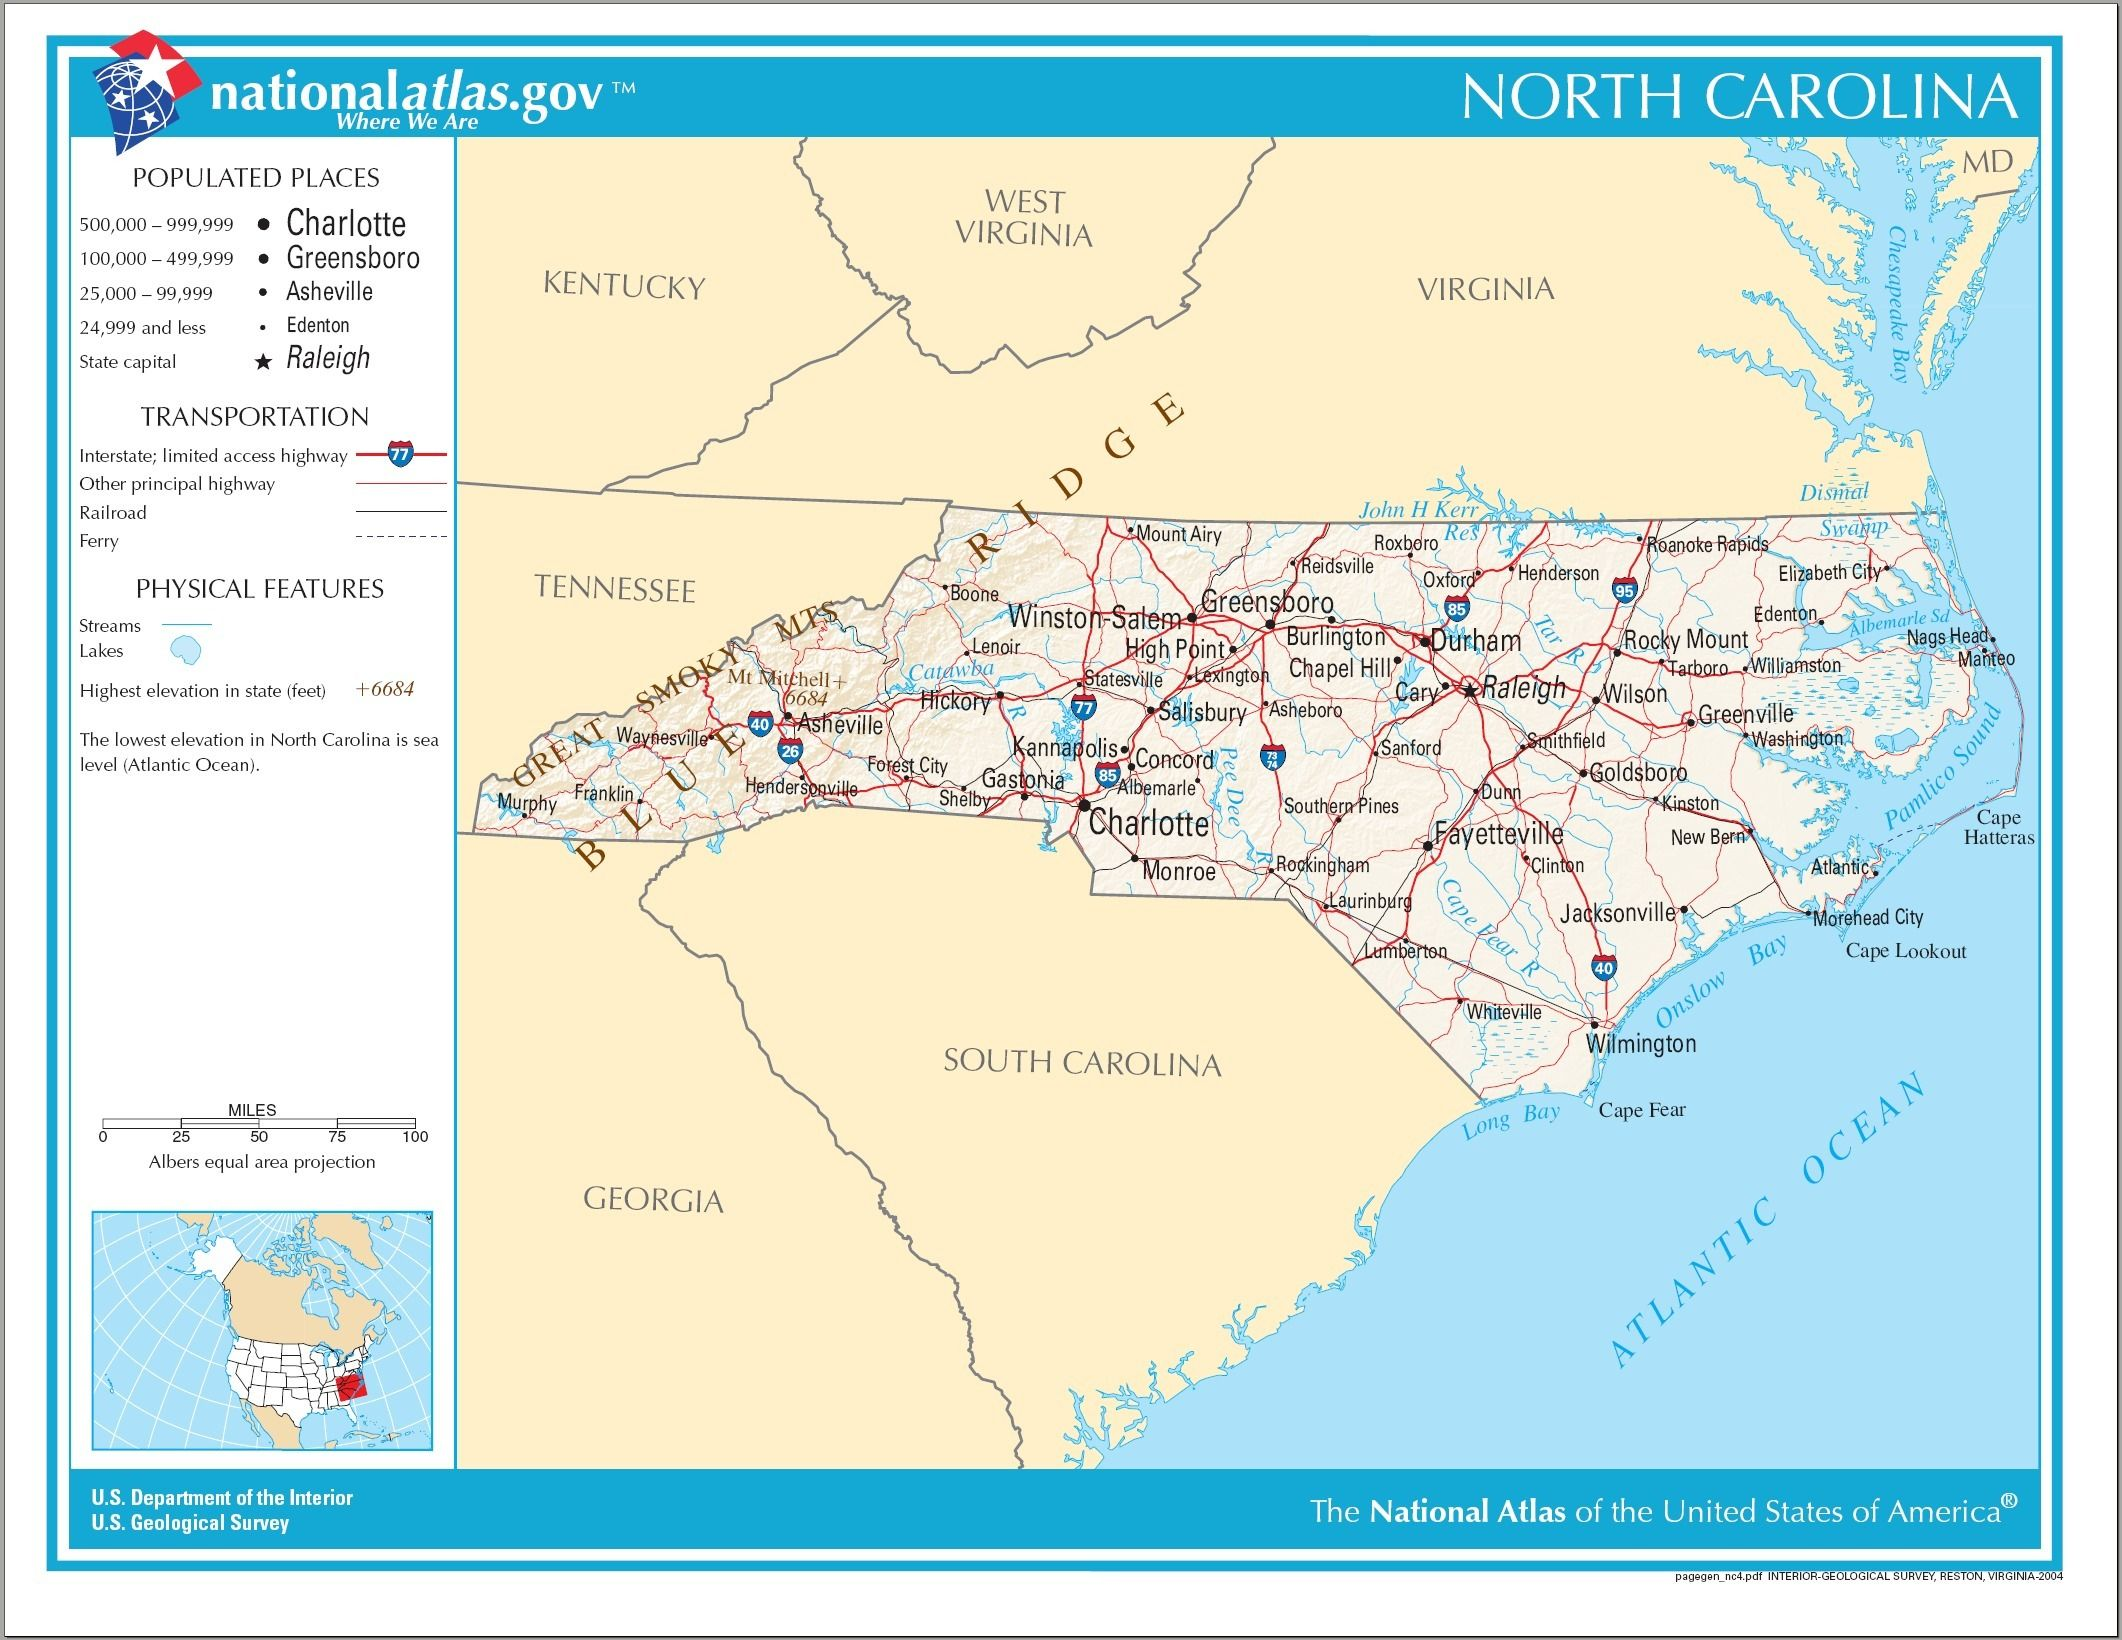 North Carolina United States Of America North Carolina Map - North-carolina-map-us